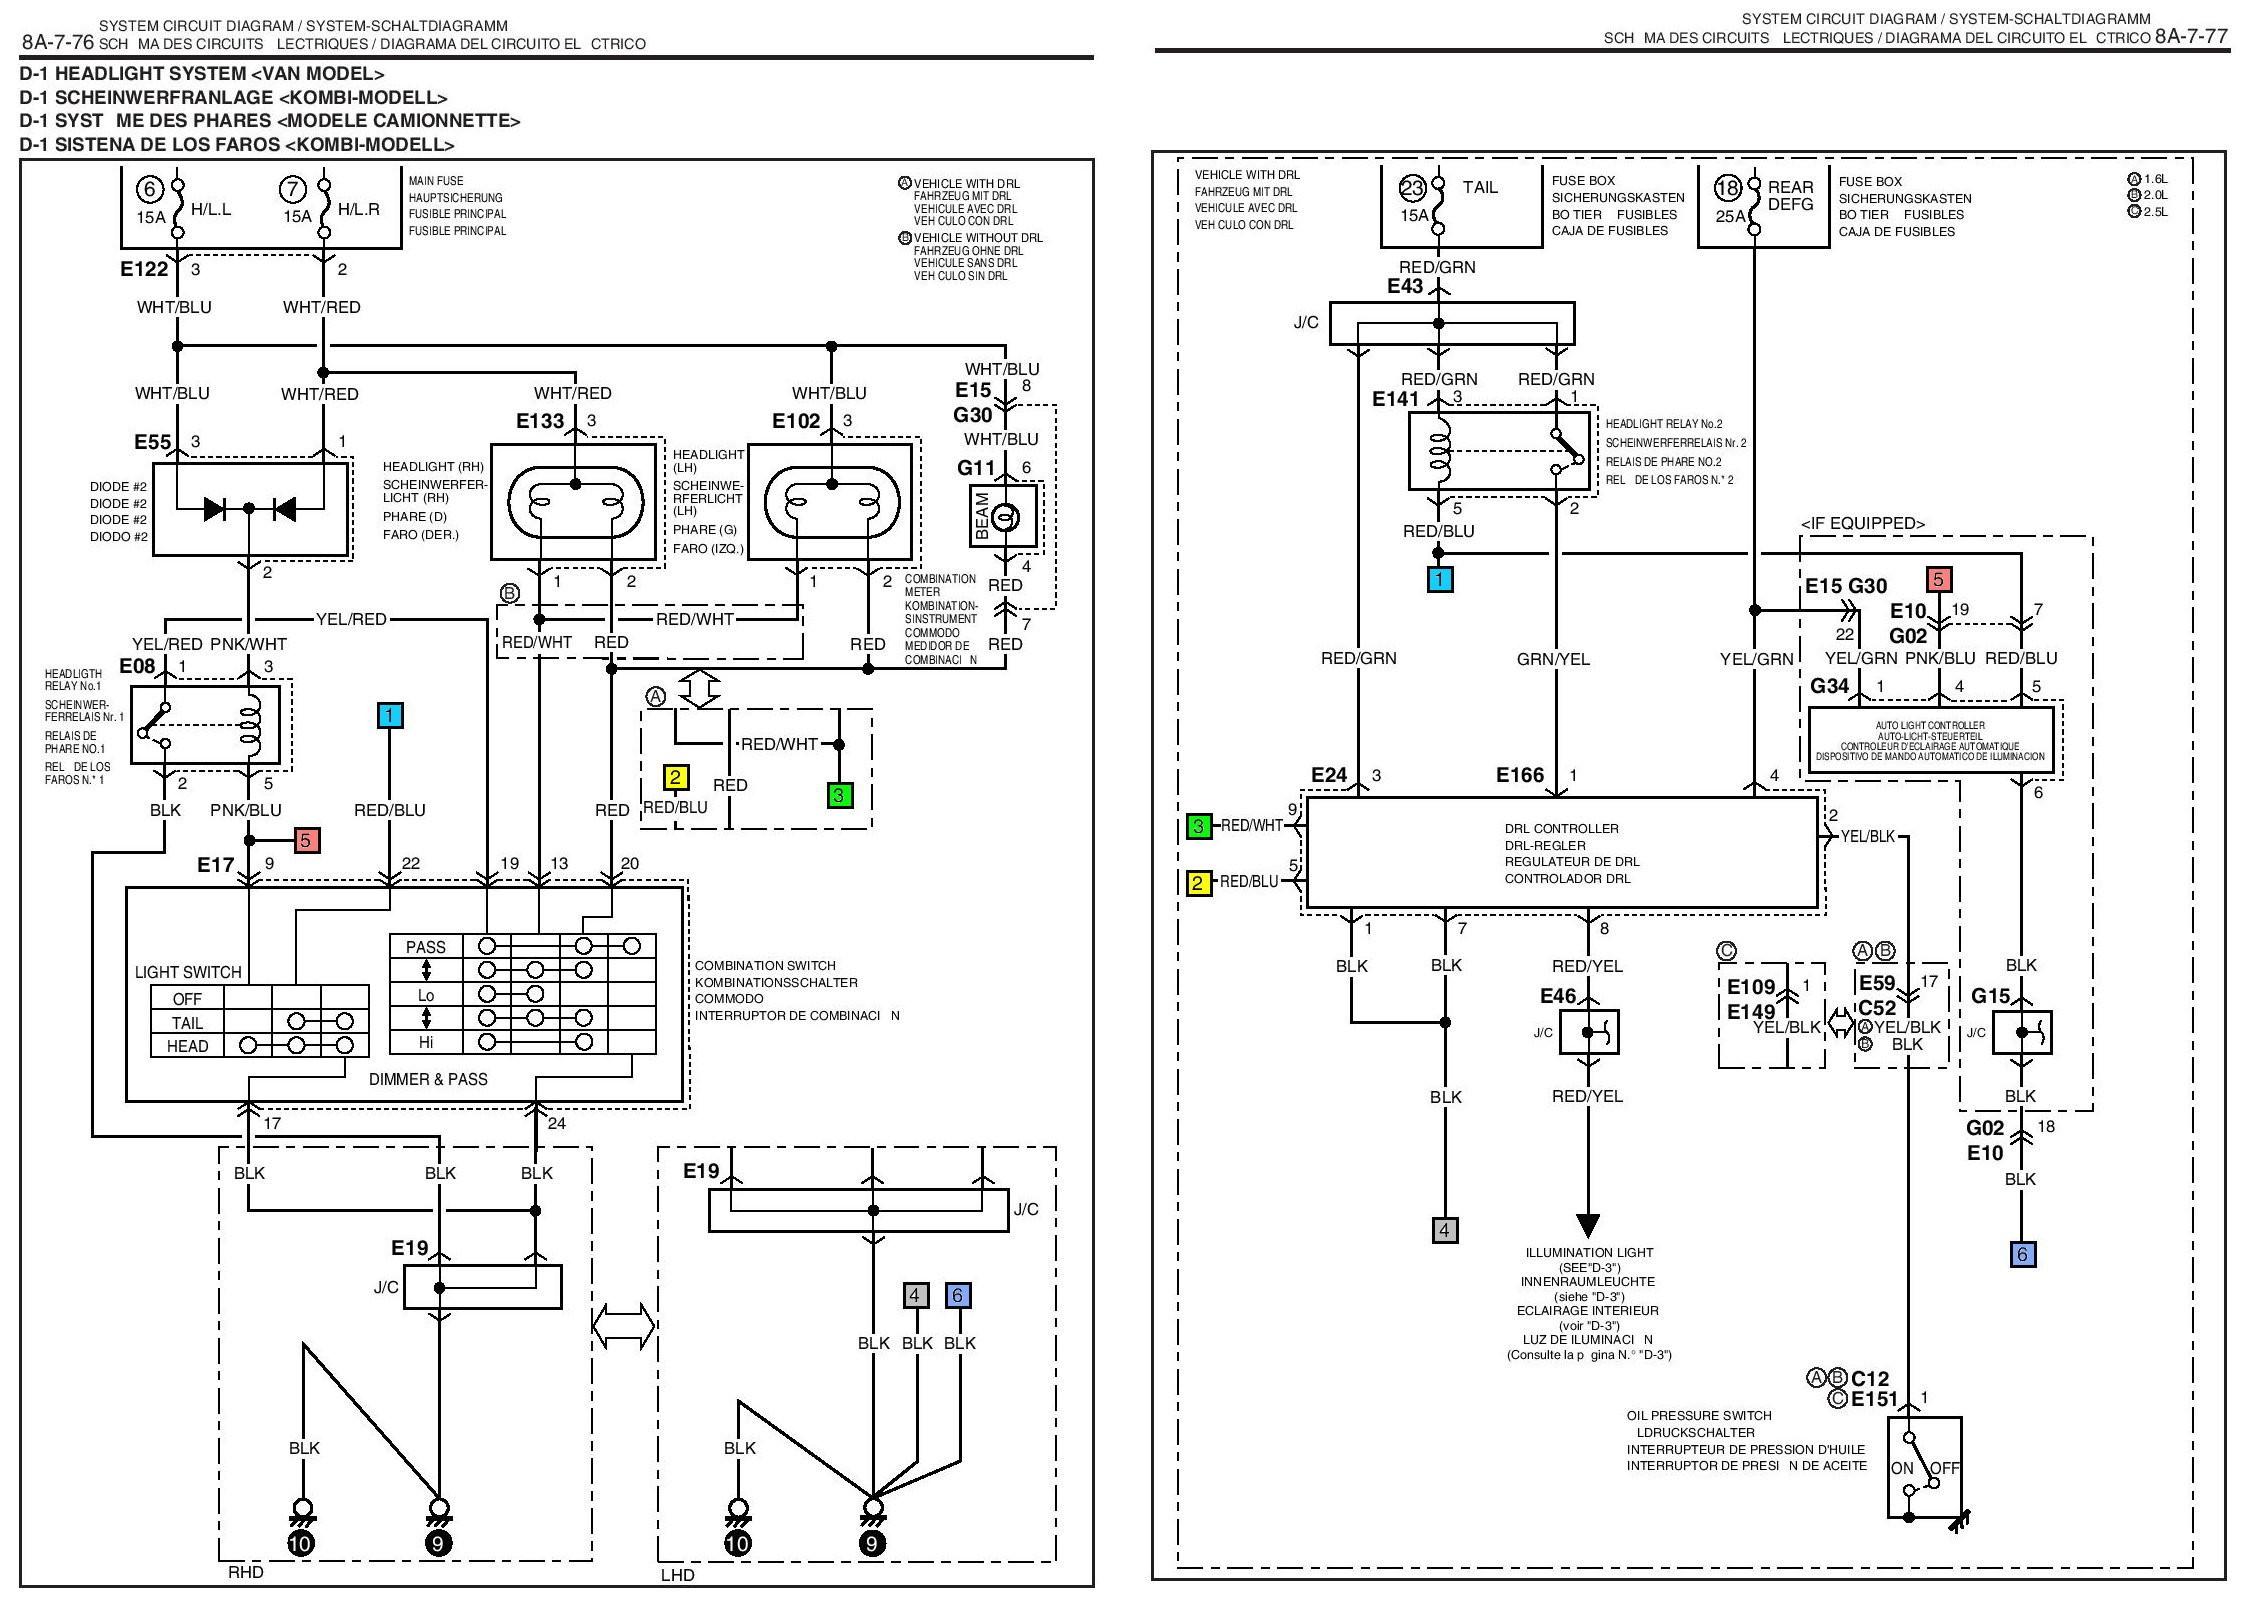 2007 Suzuki Grand Vitara Parts Manual Carnmotors Com Suzuki Grand Vitara  2018 Dash Suzuki Grand Vitara Exhaust System Diagram